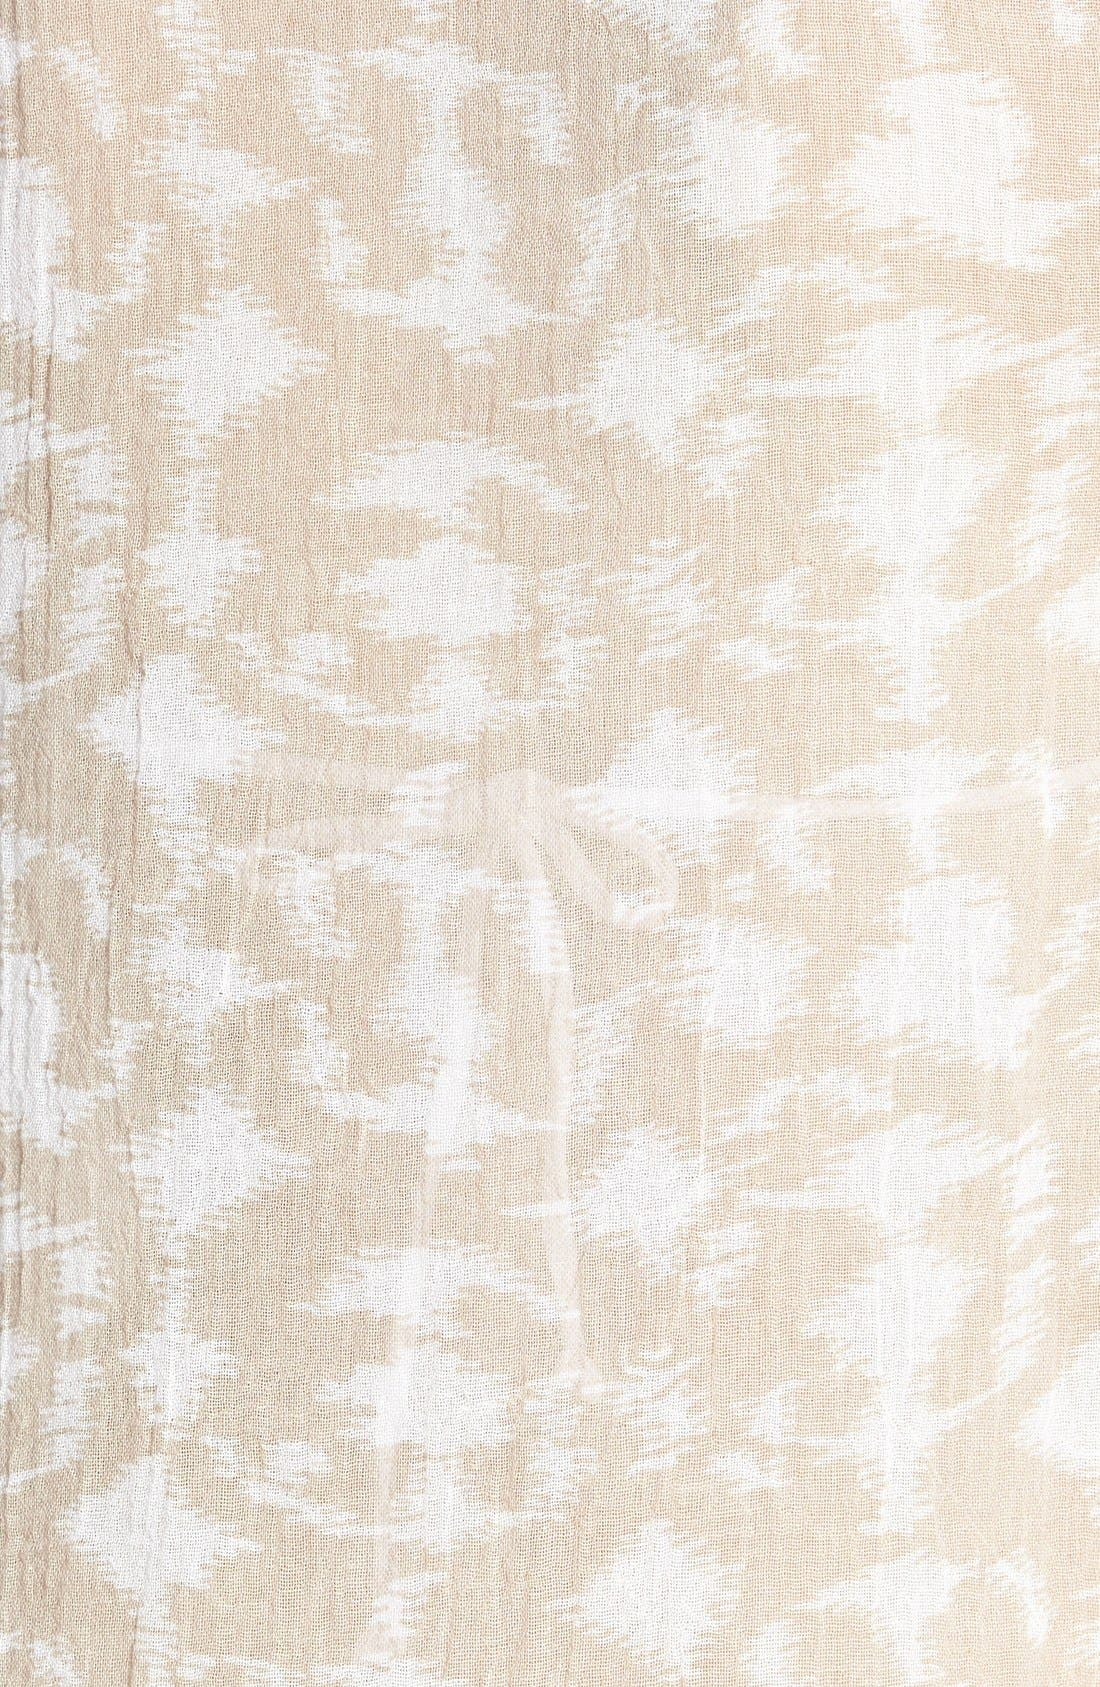 Alternate Image 3  - Eberjey 'Hidden Cove Natalya' Lace Trim Ikat Cover-Up Dress